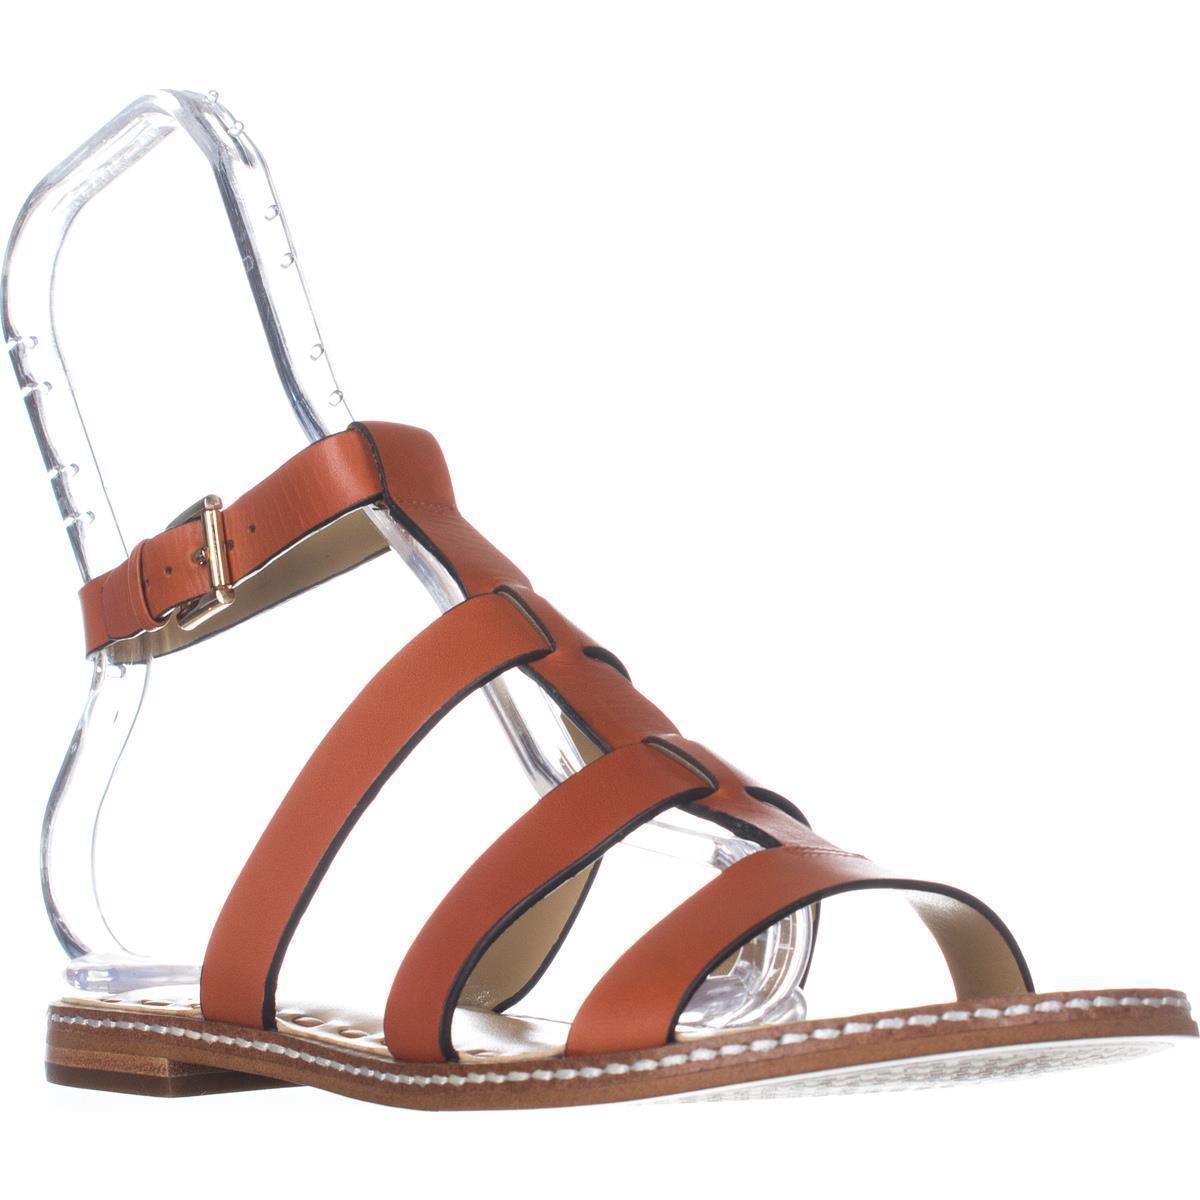 063c6c681ad Michael Kors Michael Fallon Flat Sandal Gladiator Sandals